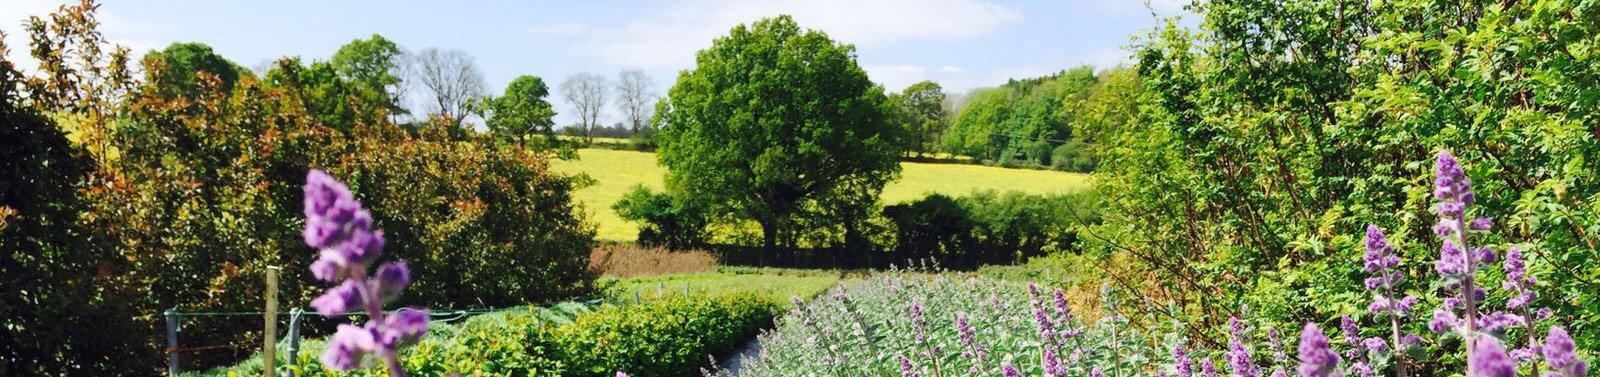 Seasonal Foliage & Herbs